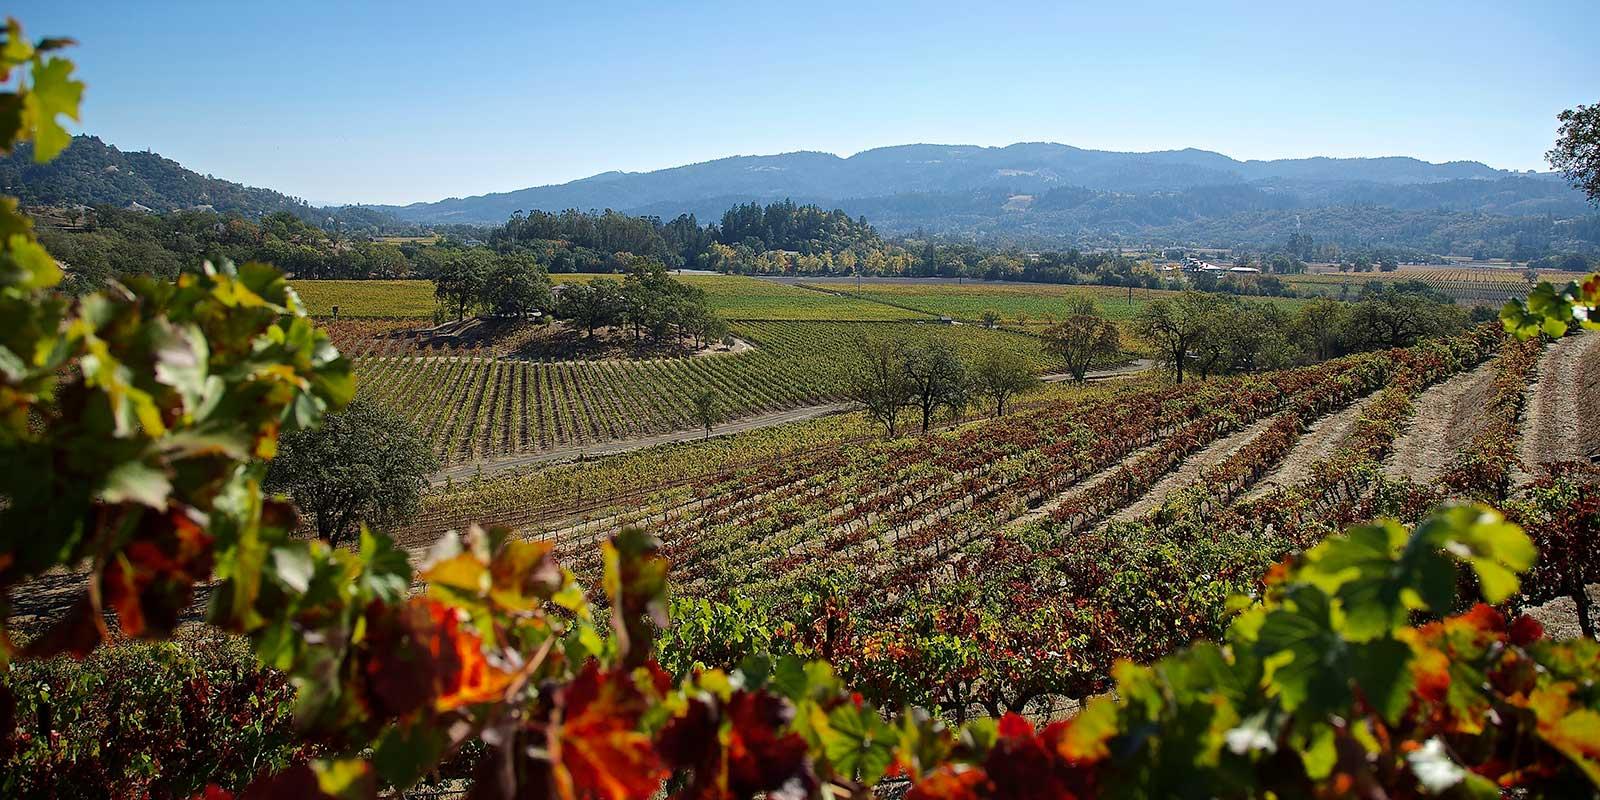 Vineyards at Chateau Montelena Winery